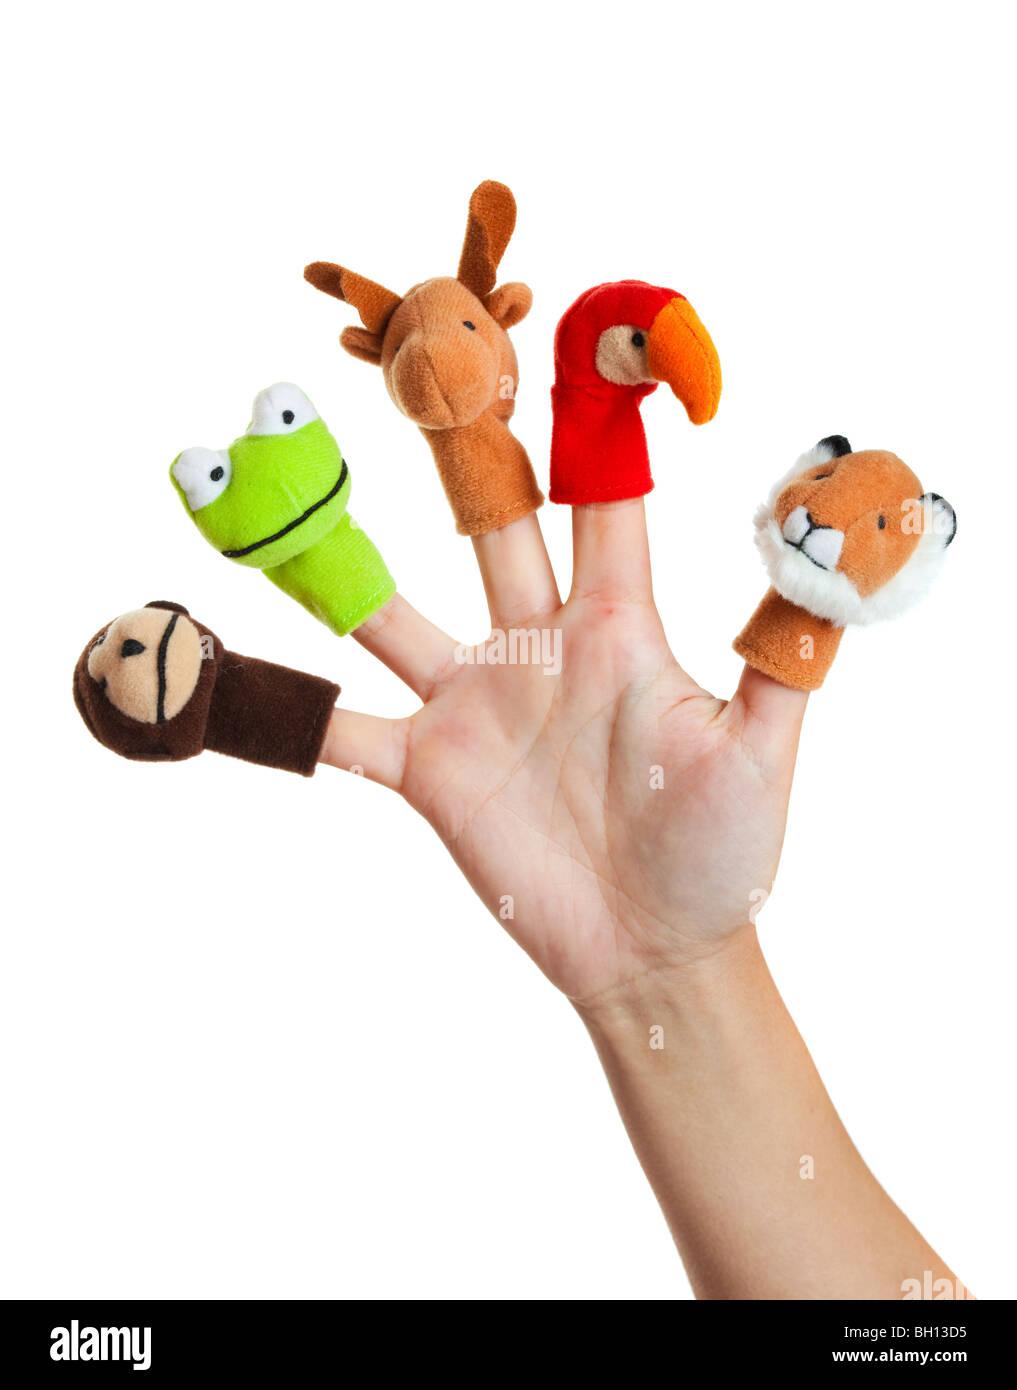 Female hand wearing 5 finger puppets; monkey, frog, reindeer, parrot; lion - Stock Image